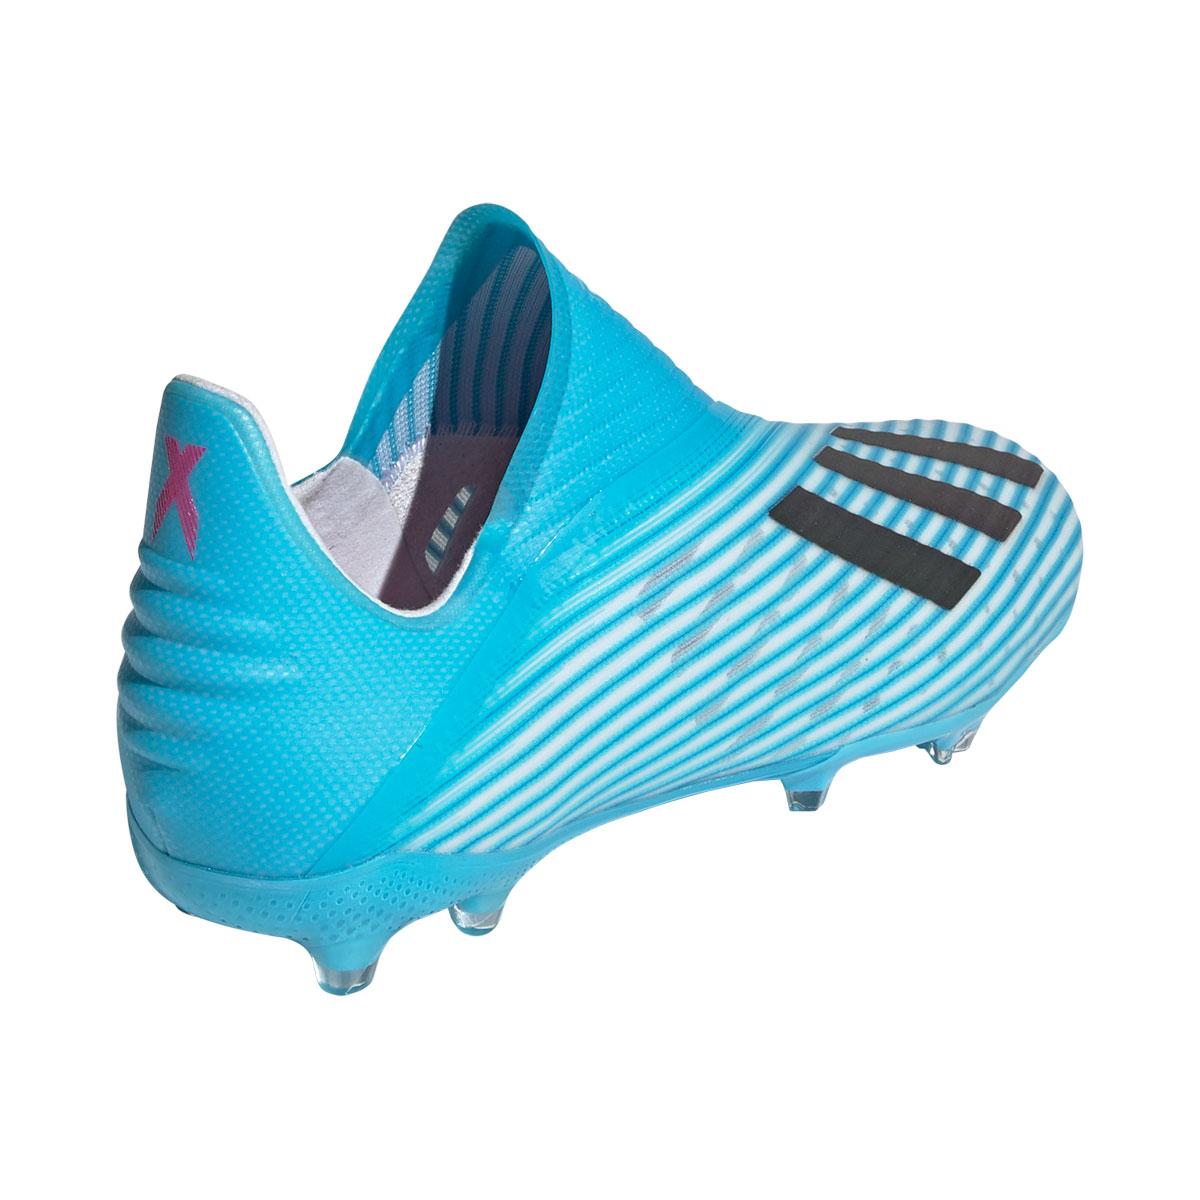 adidas Kinder Fußballschuh X 19+ FG J hellblauweiß